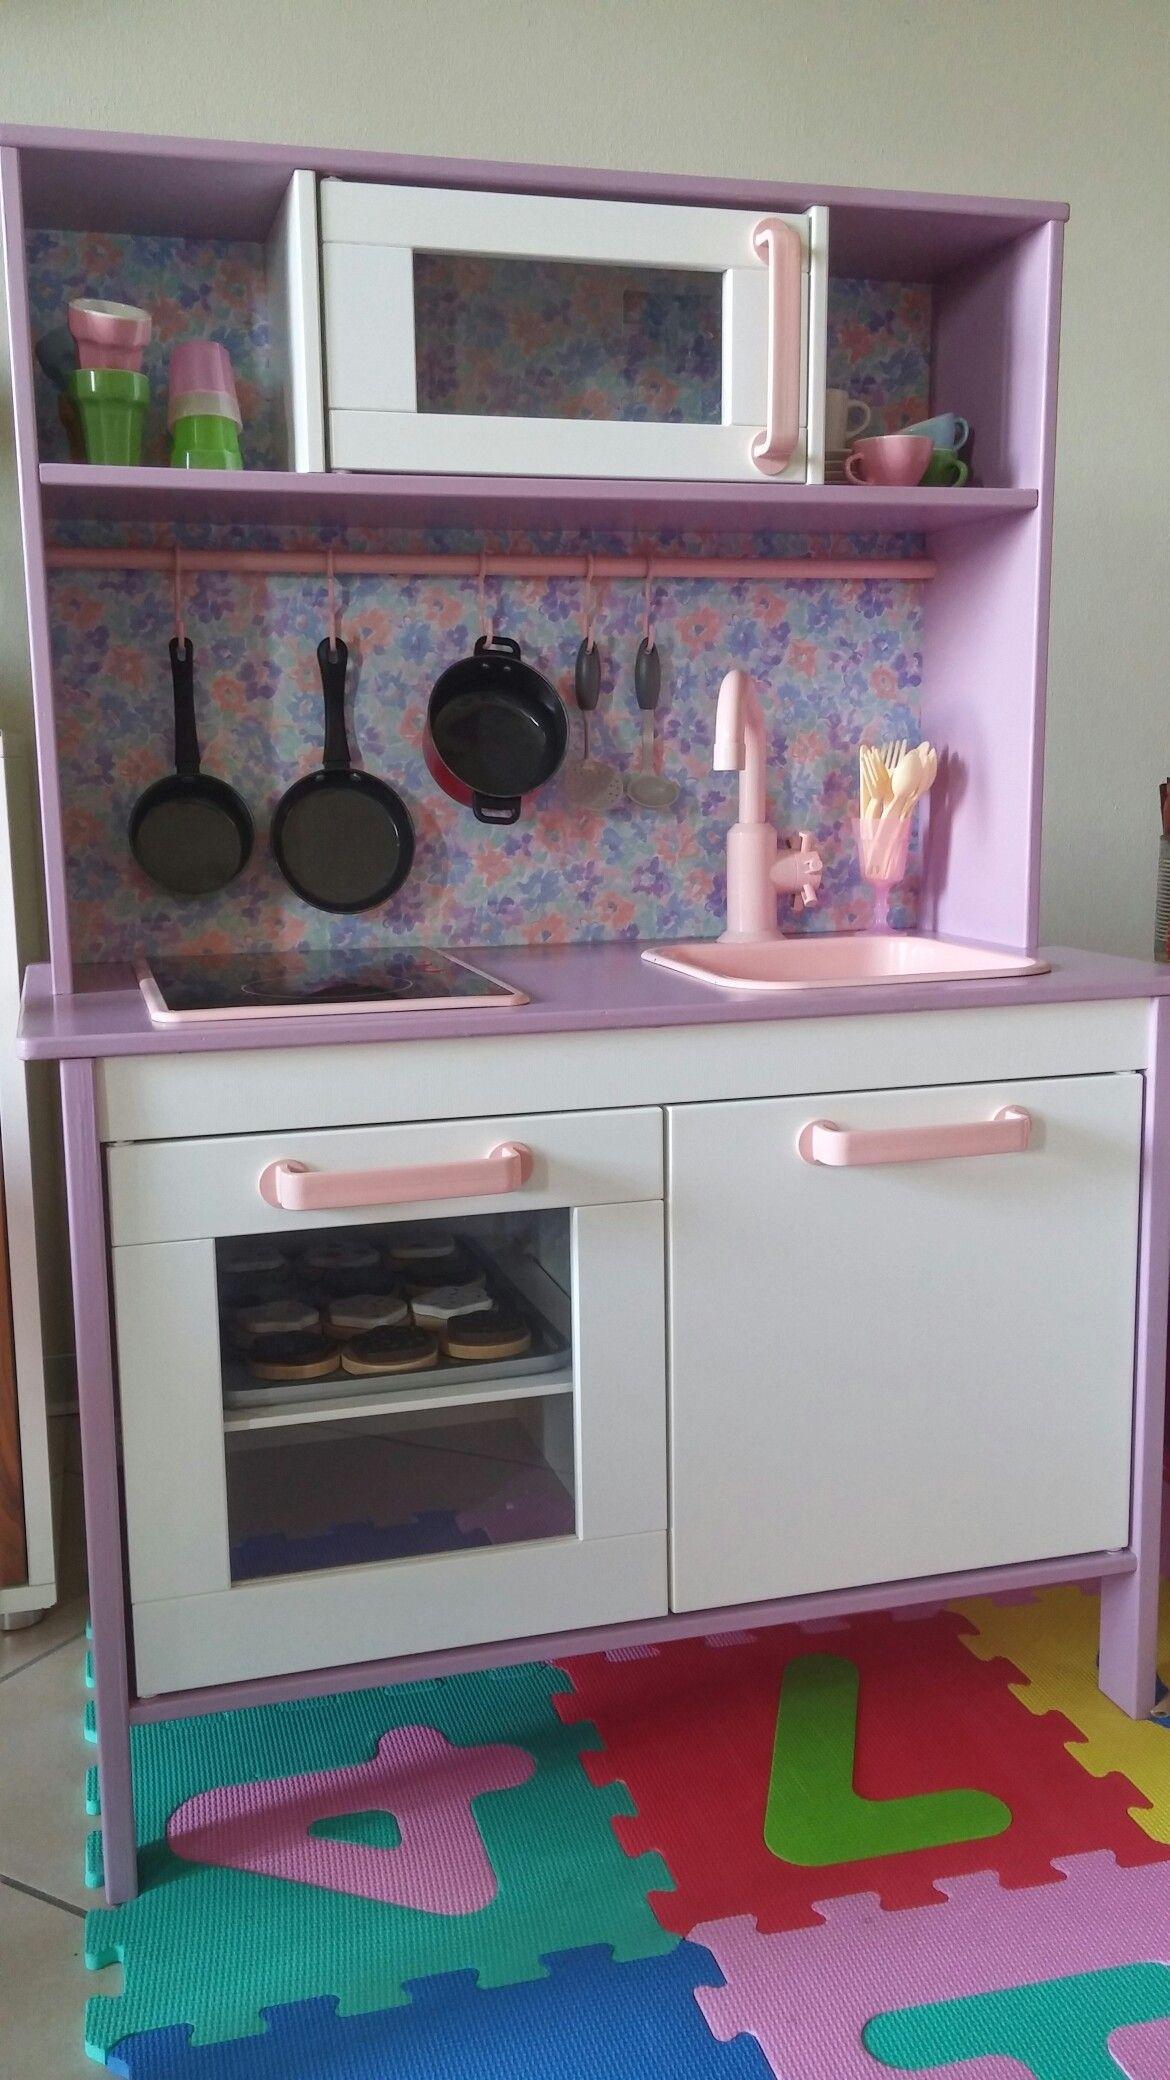 Cucina giocattolo ikea | Alinas Küche | Kitchen Appliances, Kitchen ...